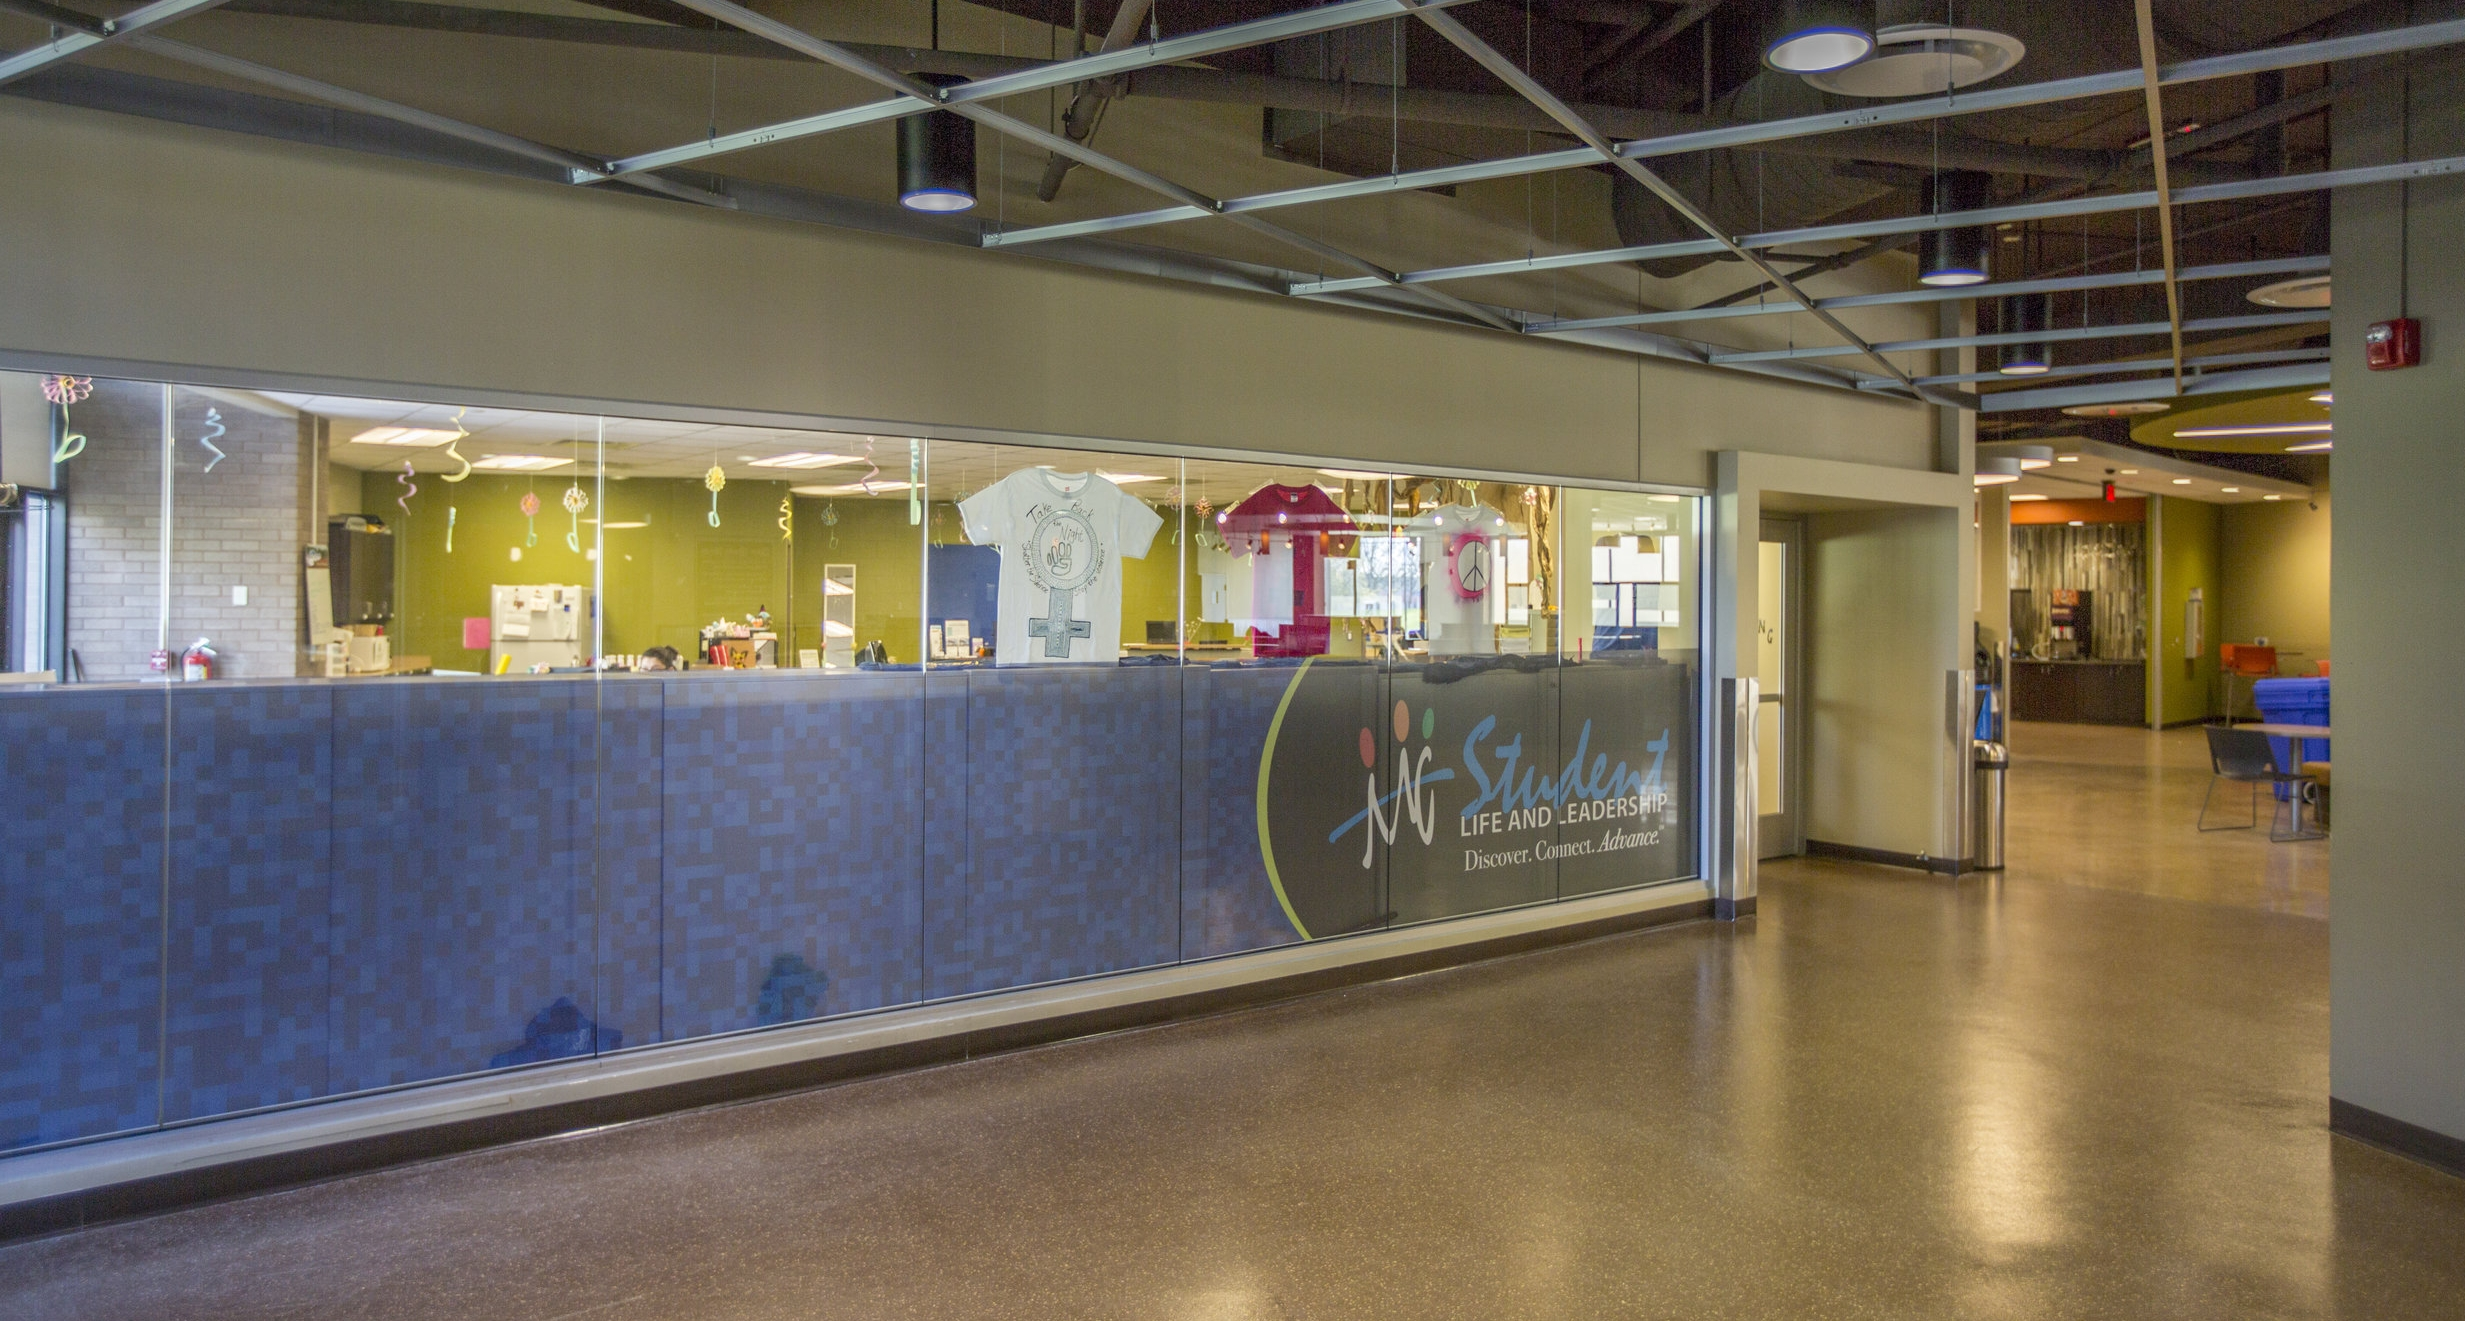 MCC_INT_Student Center Entrance 2P8A1121.jpg